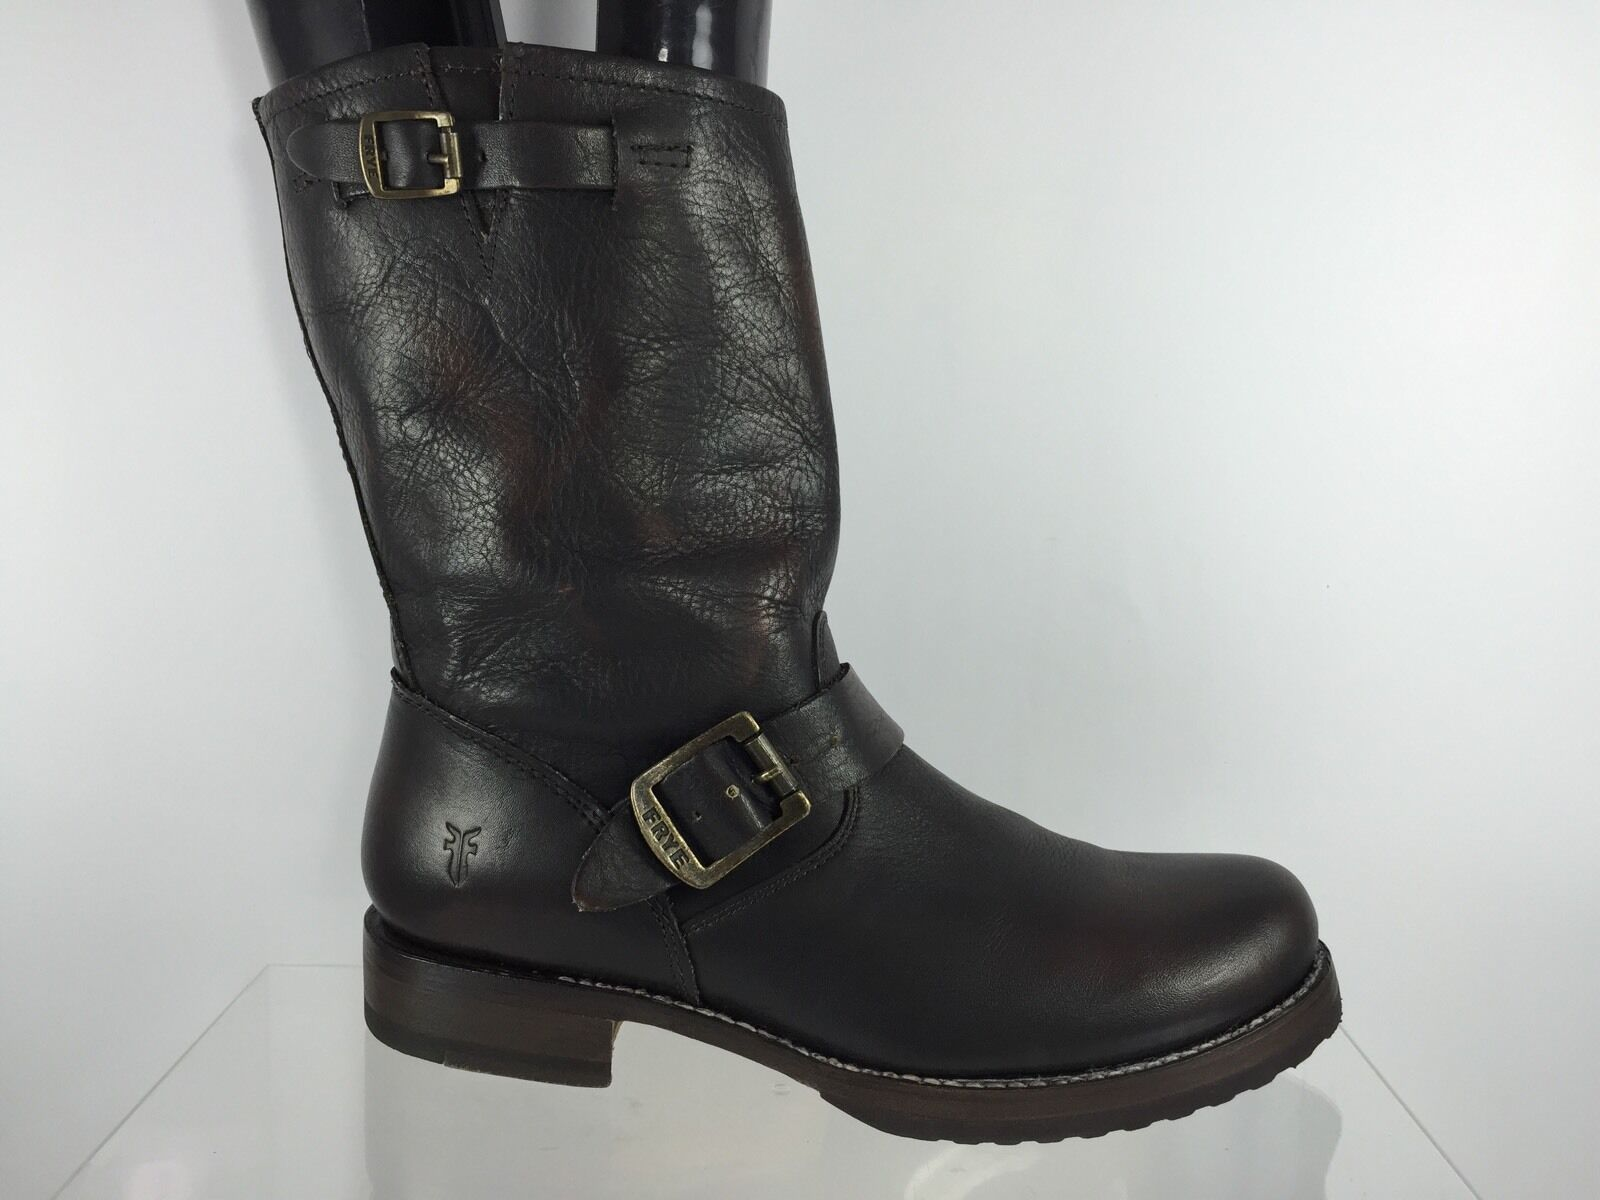 Frye Womens Dark Brown Leather Boots 8 B